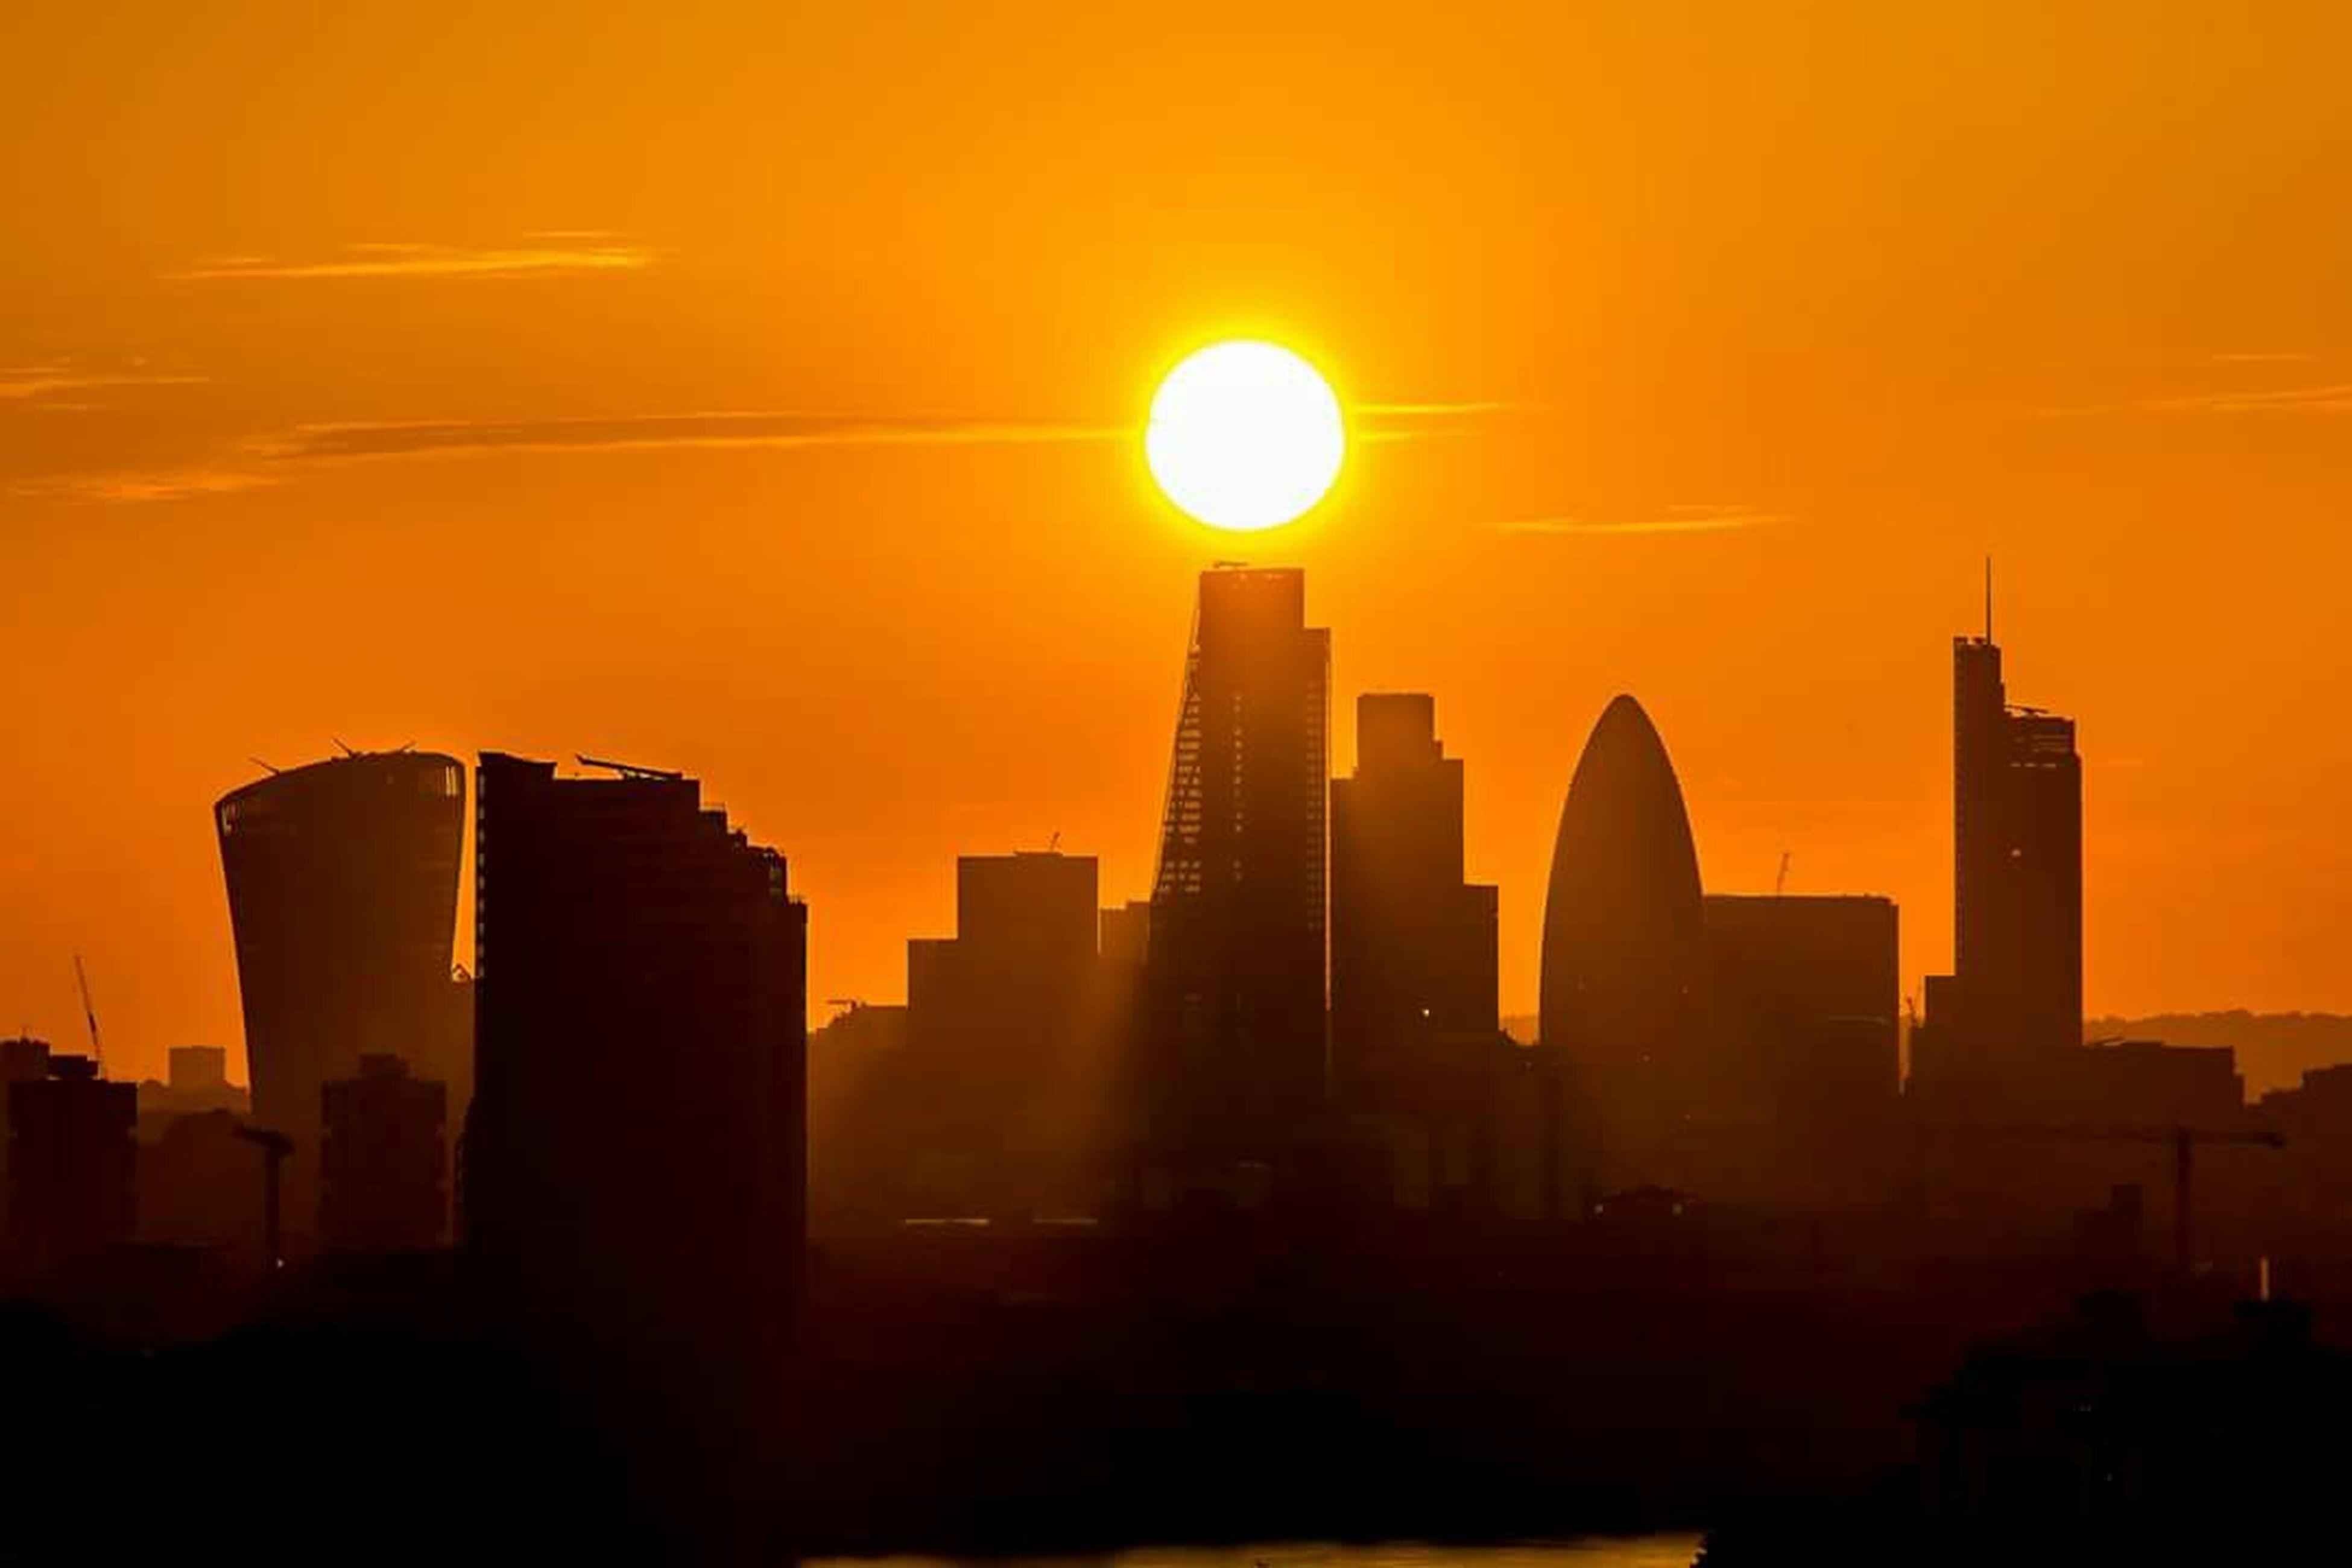 sunset, architecture, building exterior, built structure, silhouette, city, skyscraper, orange color, sun, cityscape, sky, urban skyline, building, office building, modern, tower, tall - high, dark, skyline, outdoors